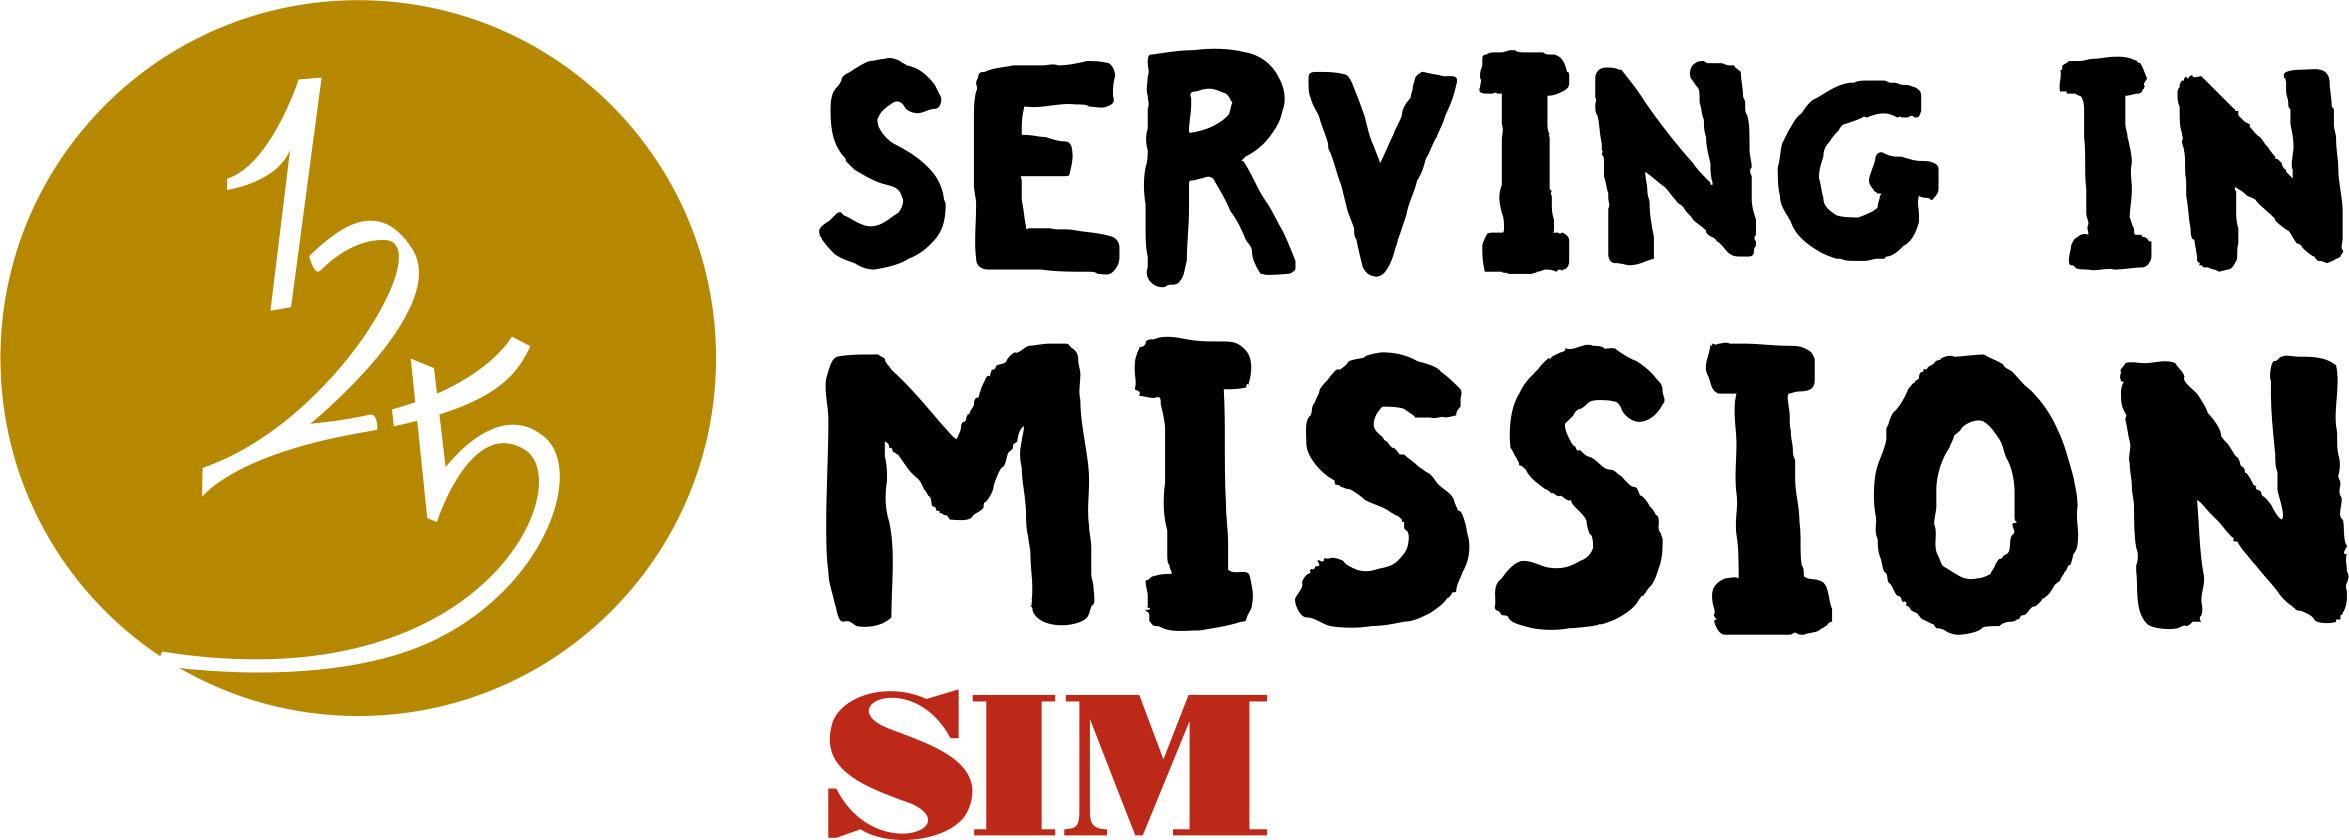 Serving 125 SIM - HR.jpg